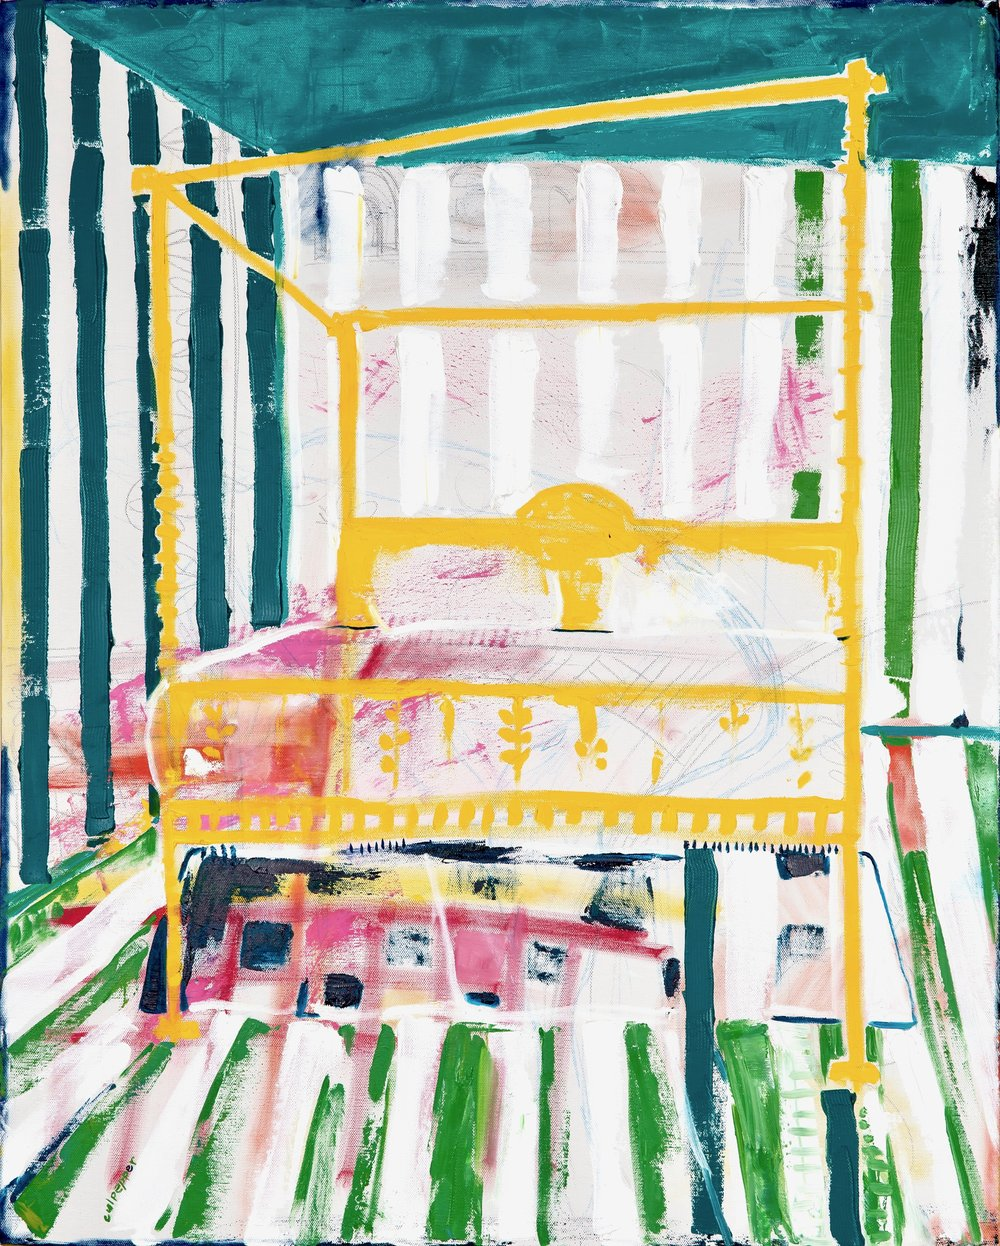 flipside    oil + pencil on canvas  |  30 x 24